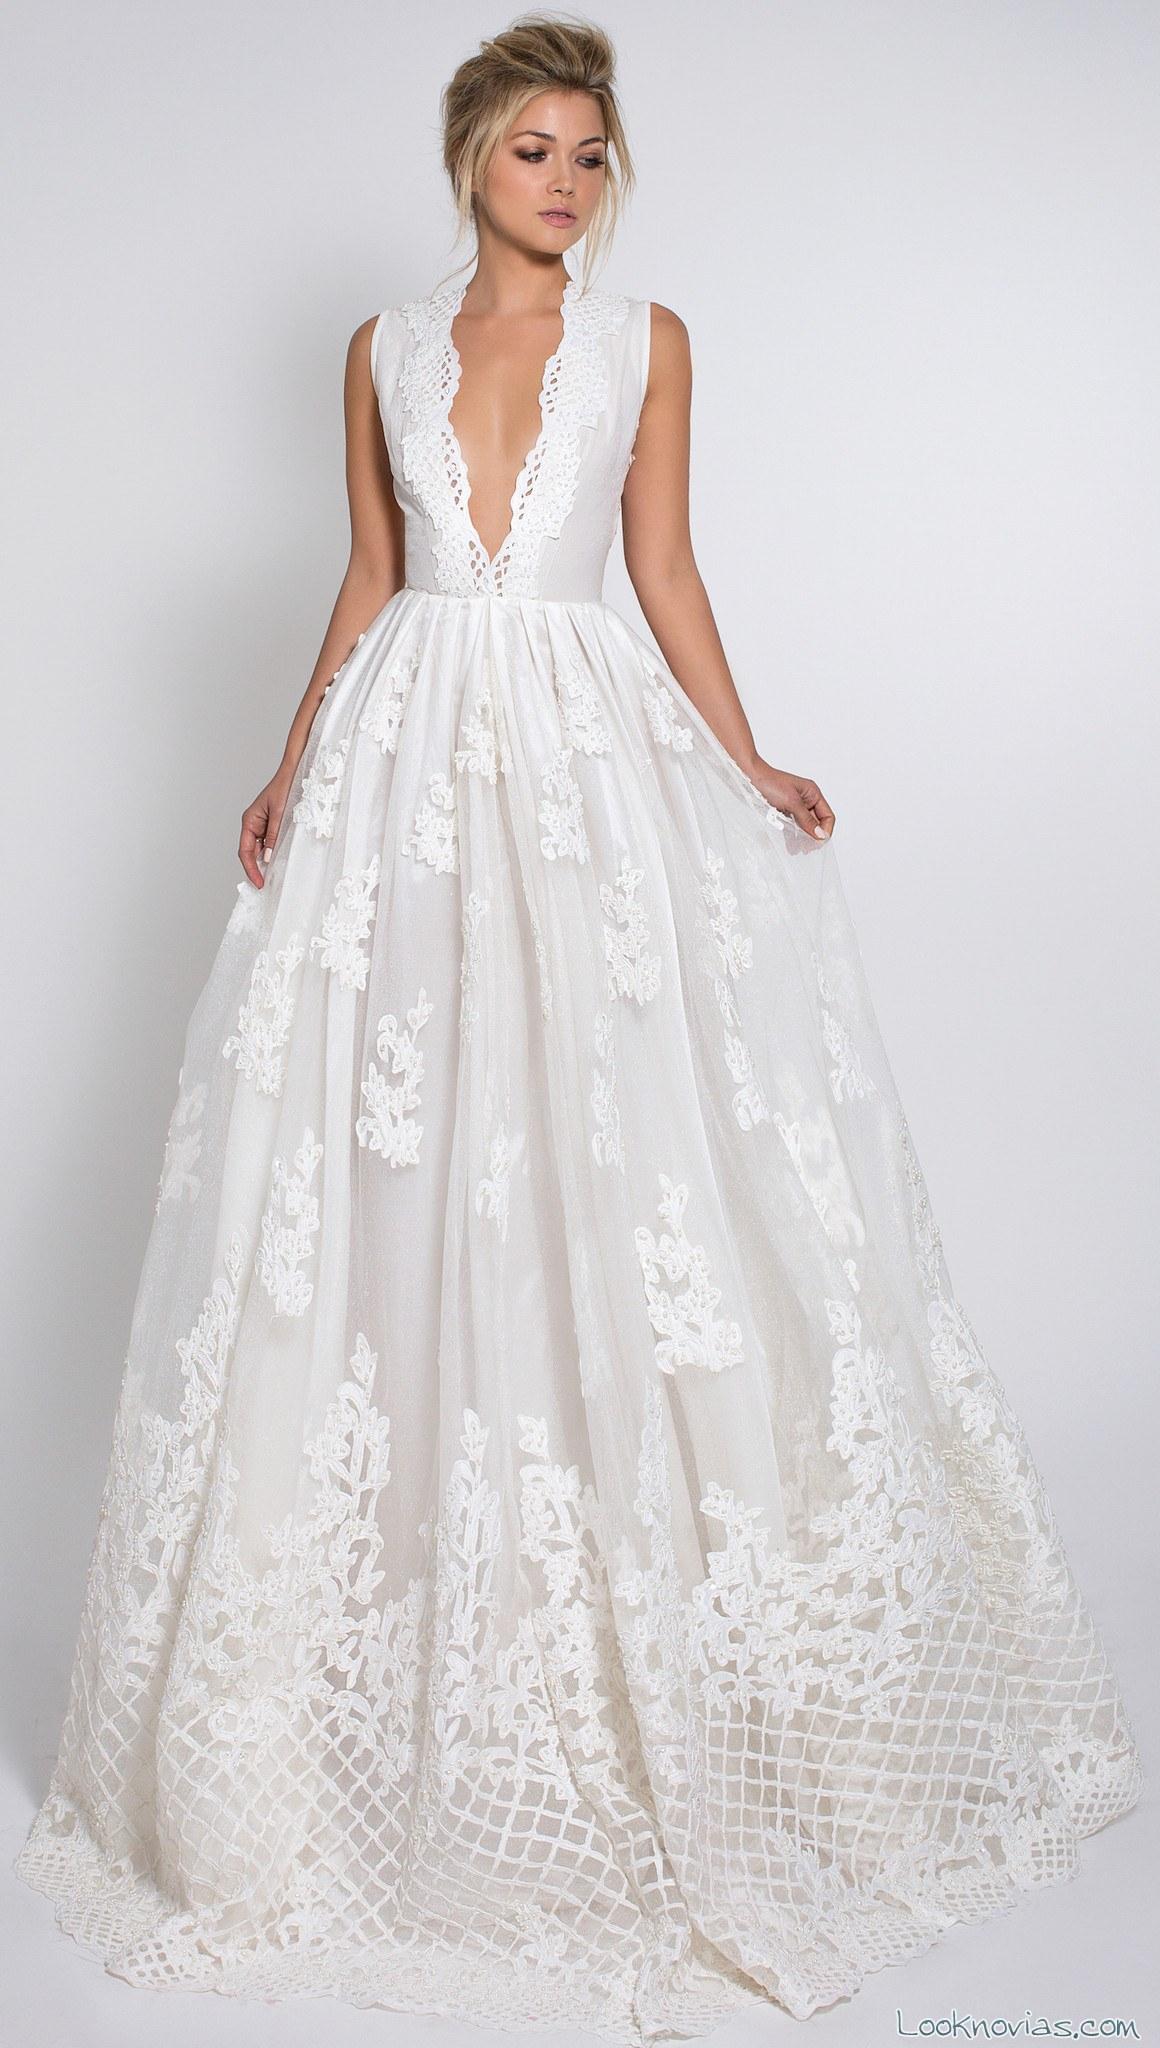 vestido novia tirantes anchos con bordados